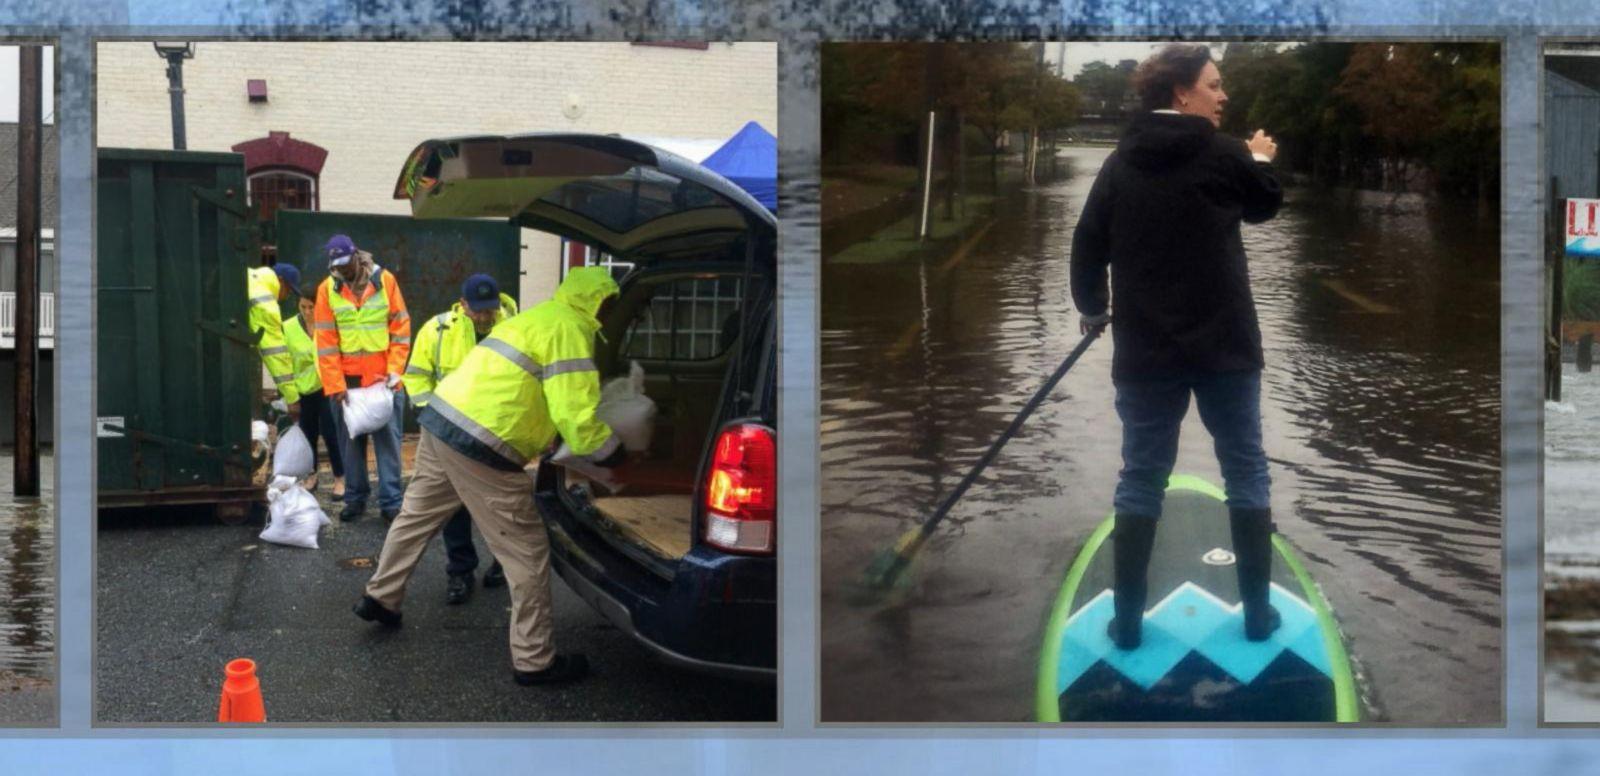 VIDEO: Historic Rainfall, Flooding to Hit the East Coast